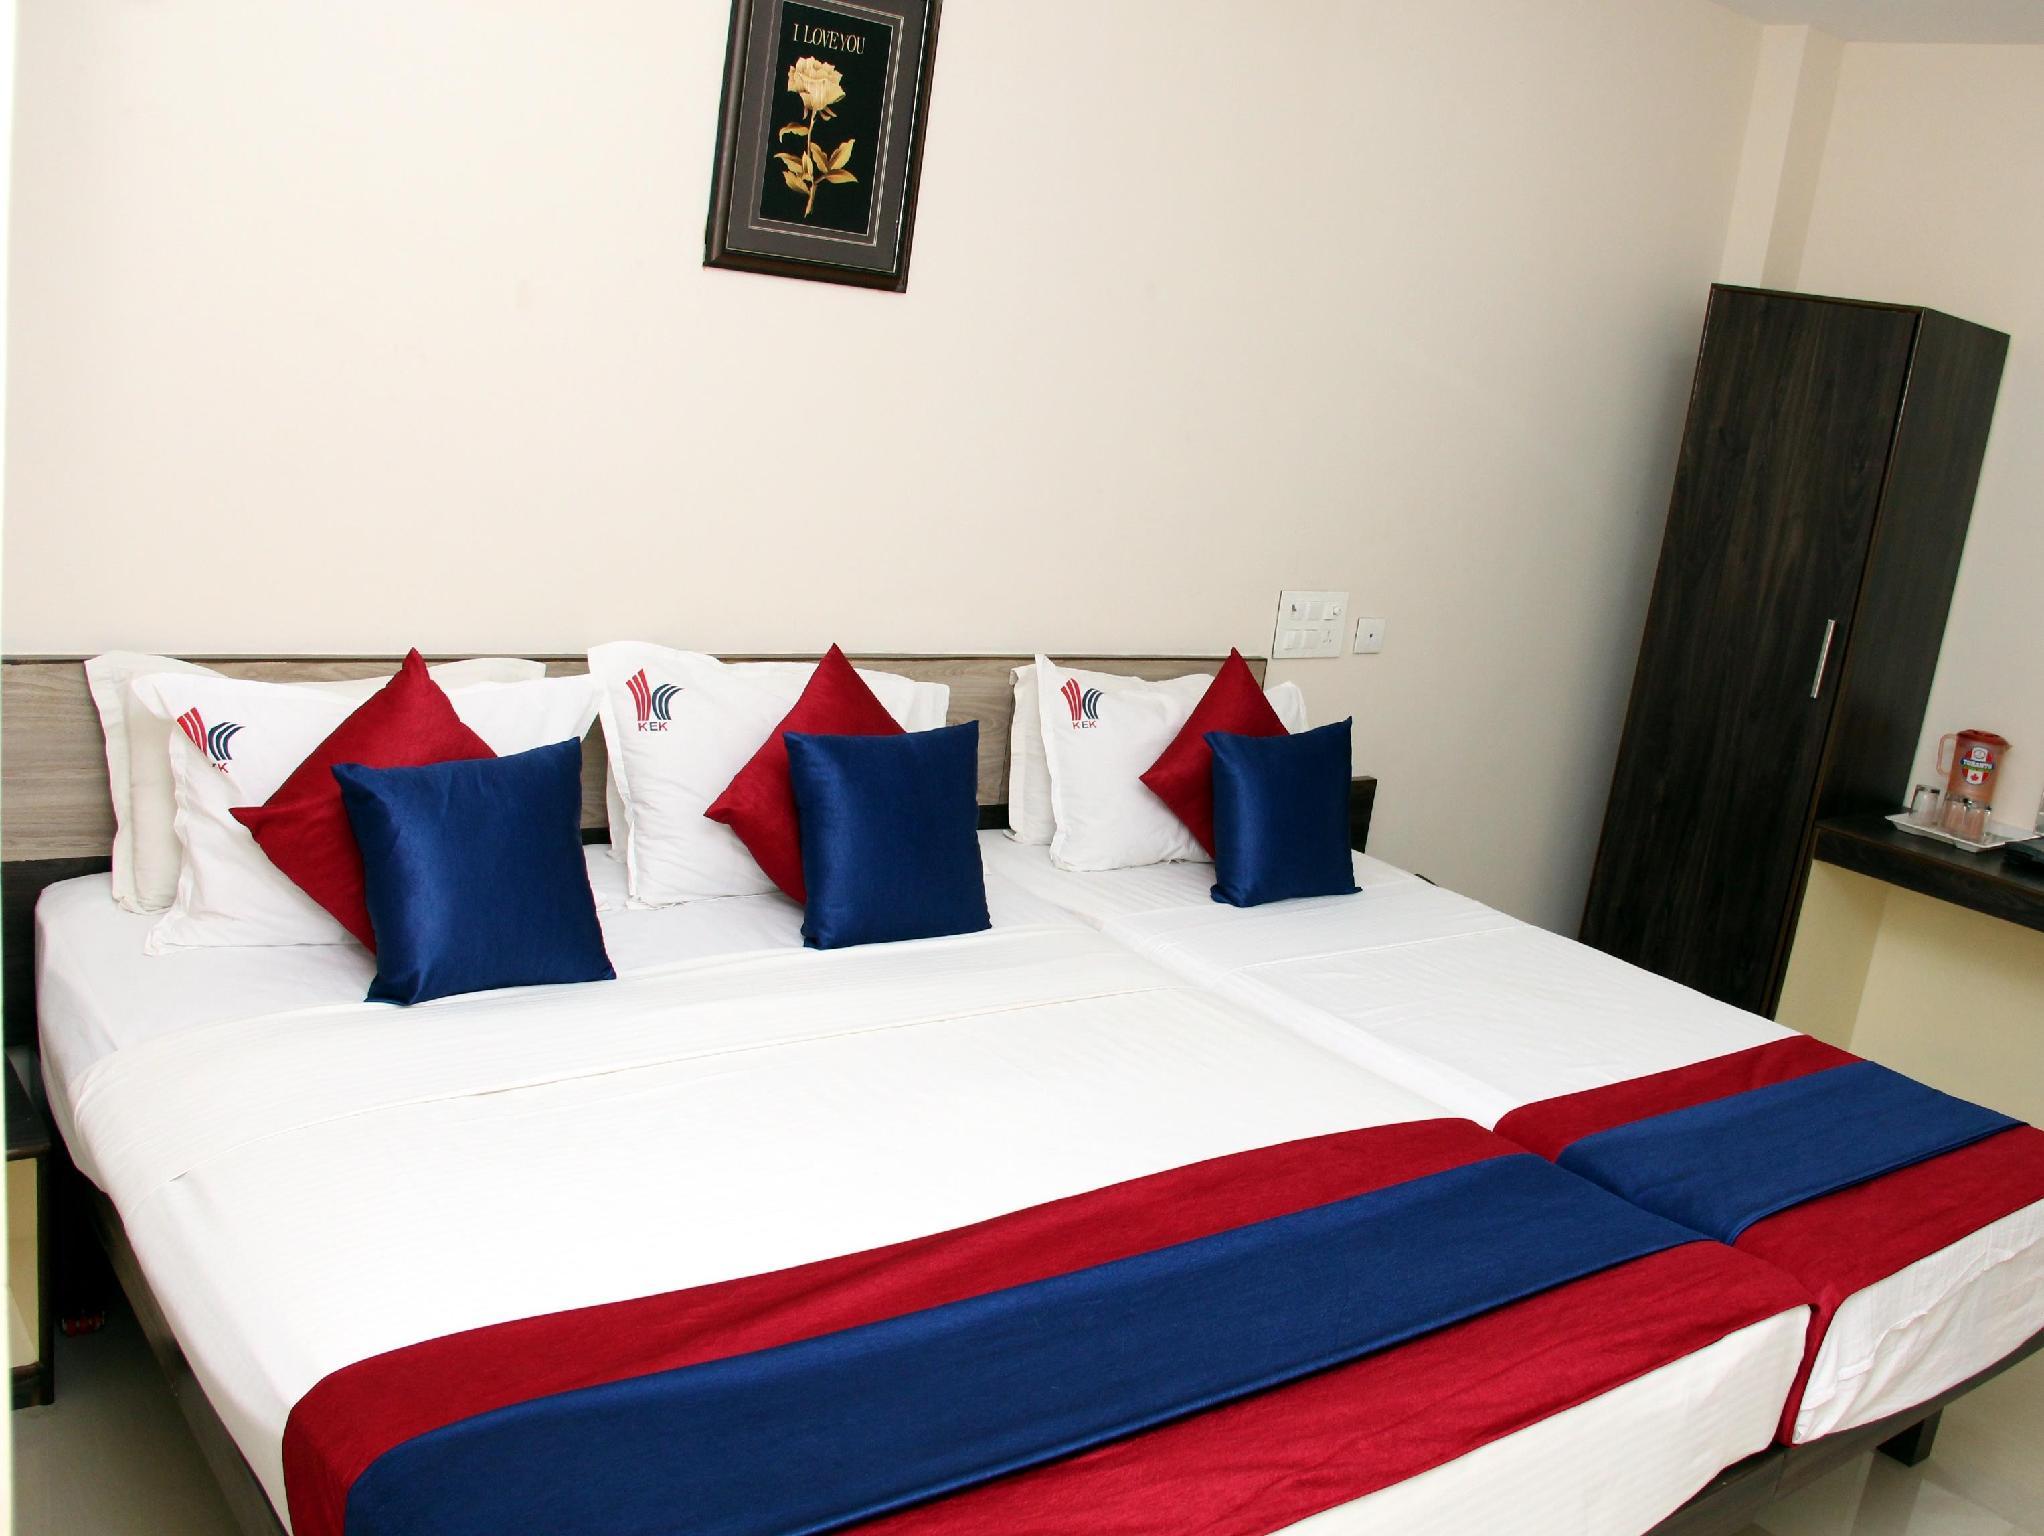 KEK Accommodation Annexure   I